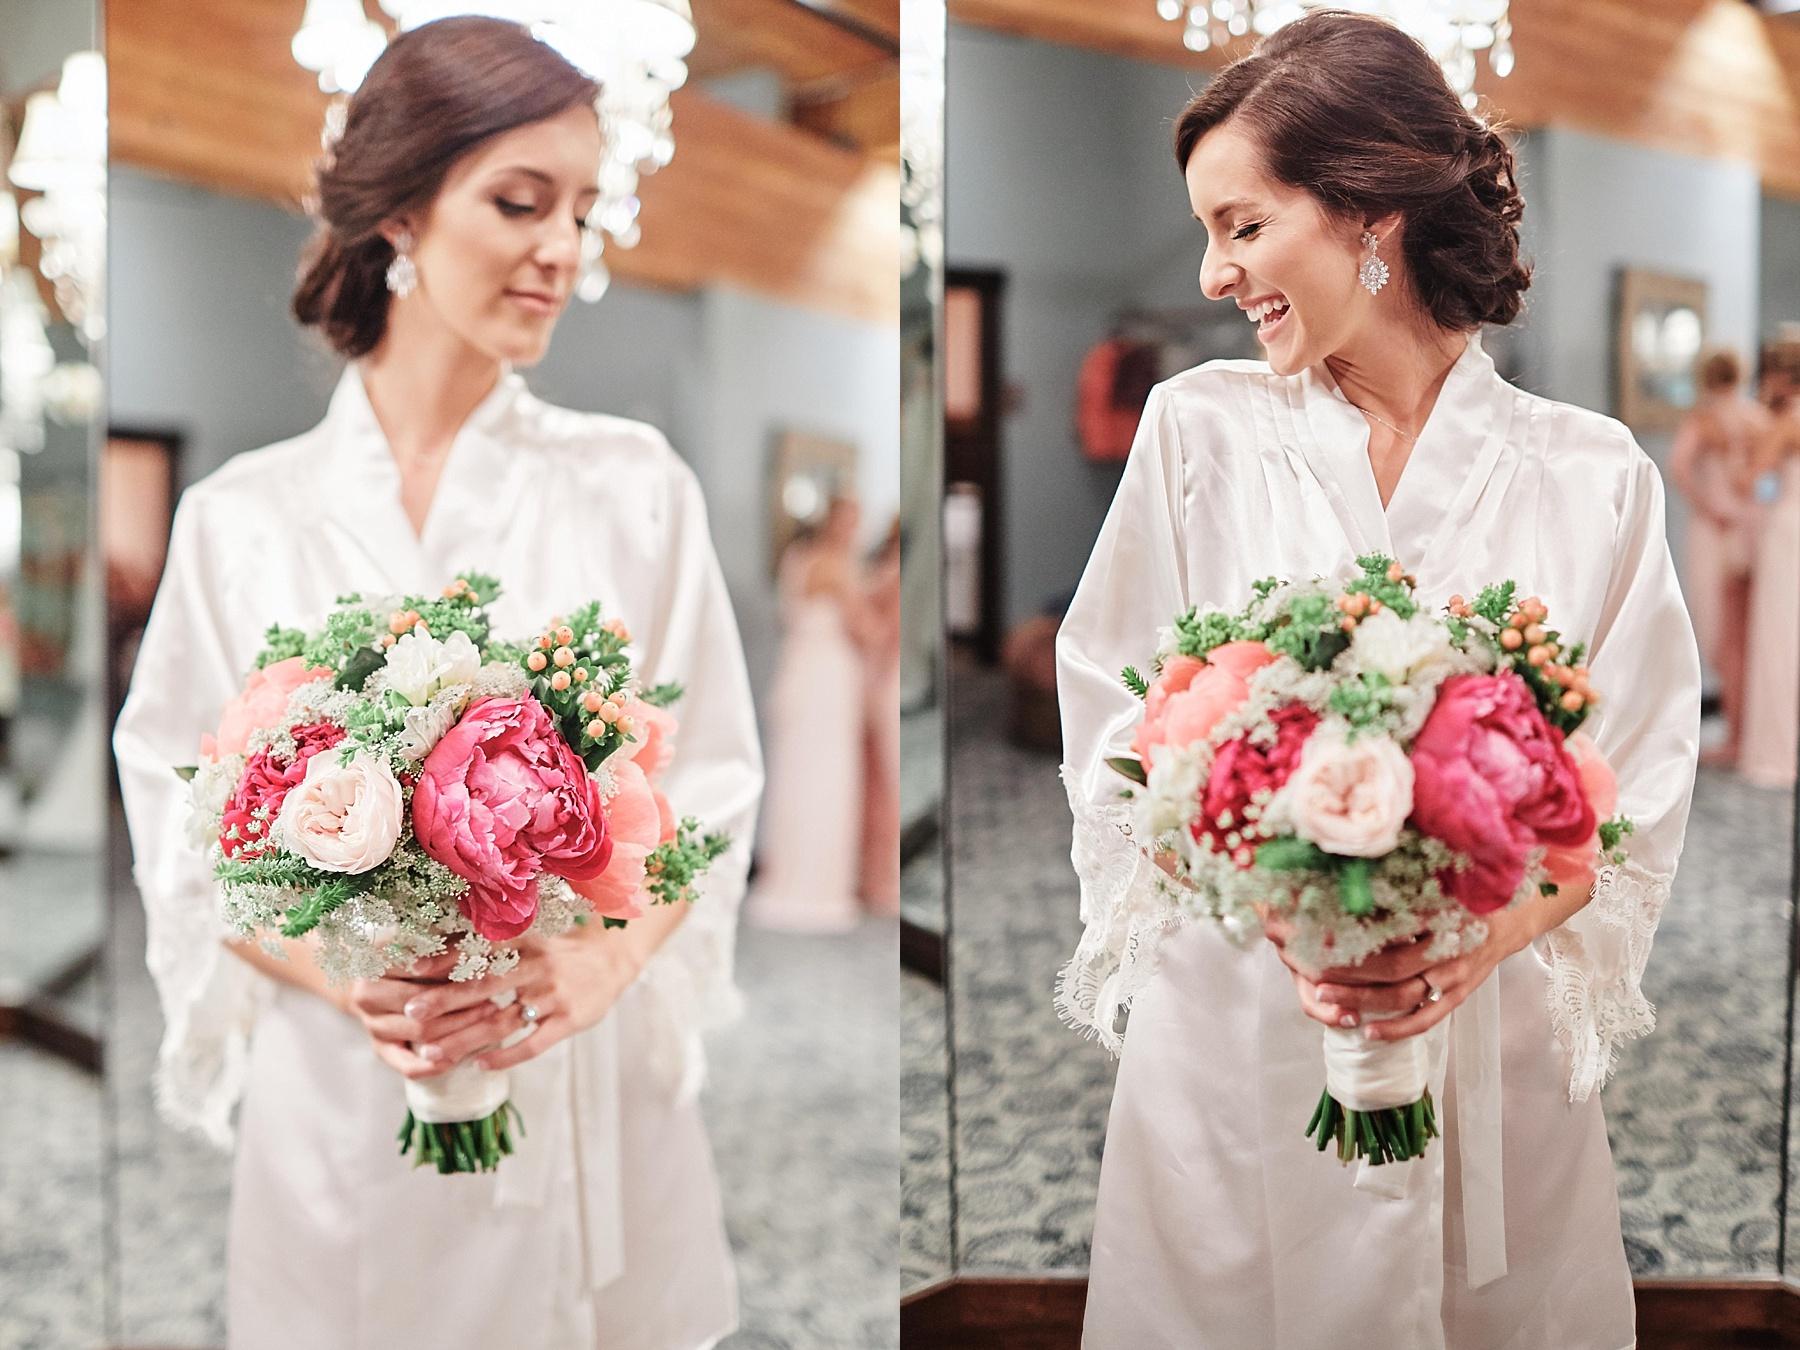 ABULAE-Wedding-Saint-paul-MN-Josh-Sofia-Wedding-Mears-Park_0726.jpg